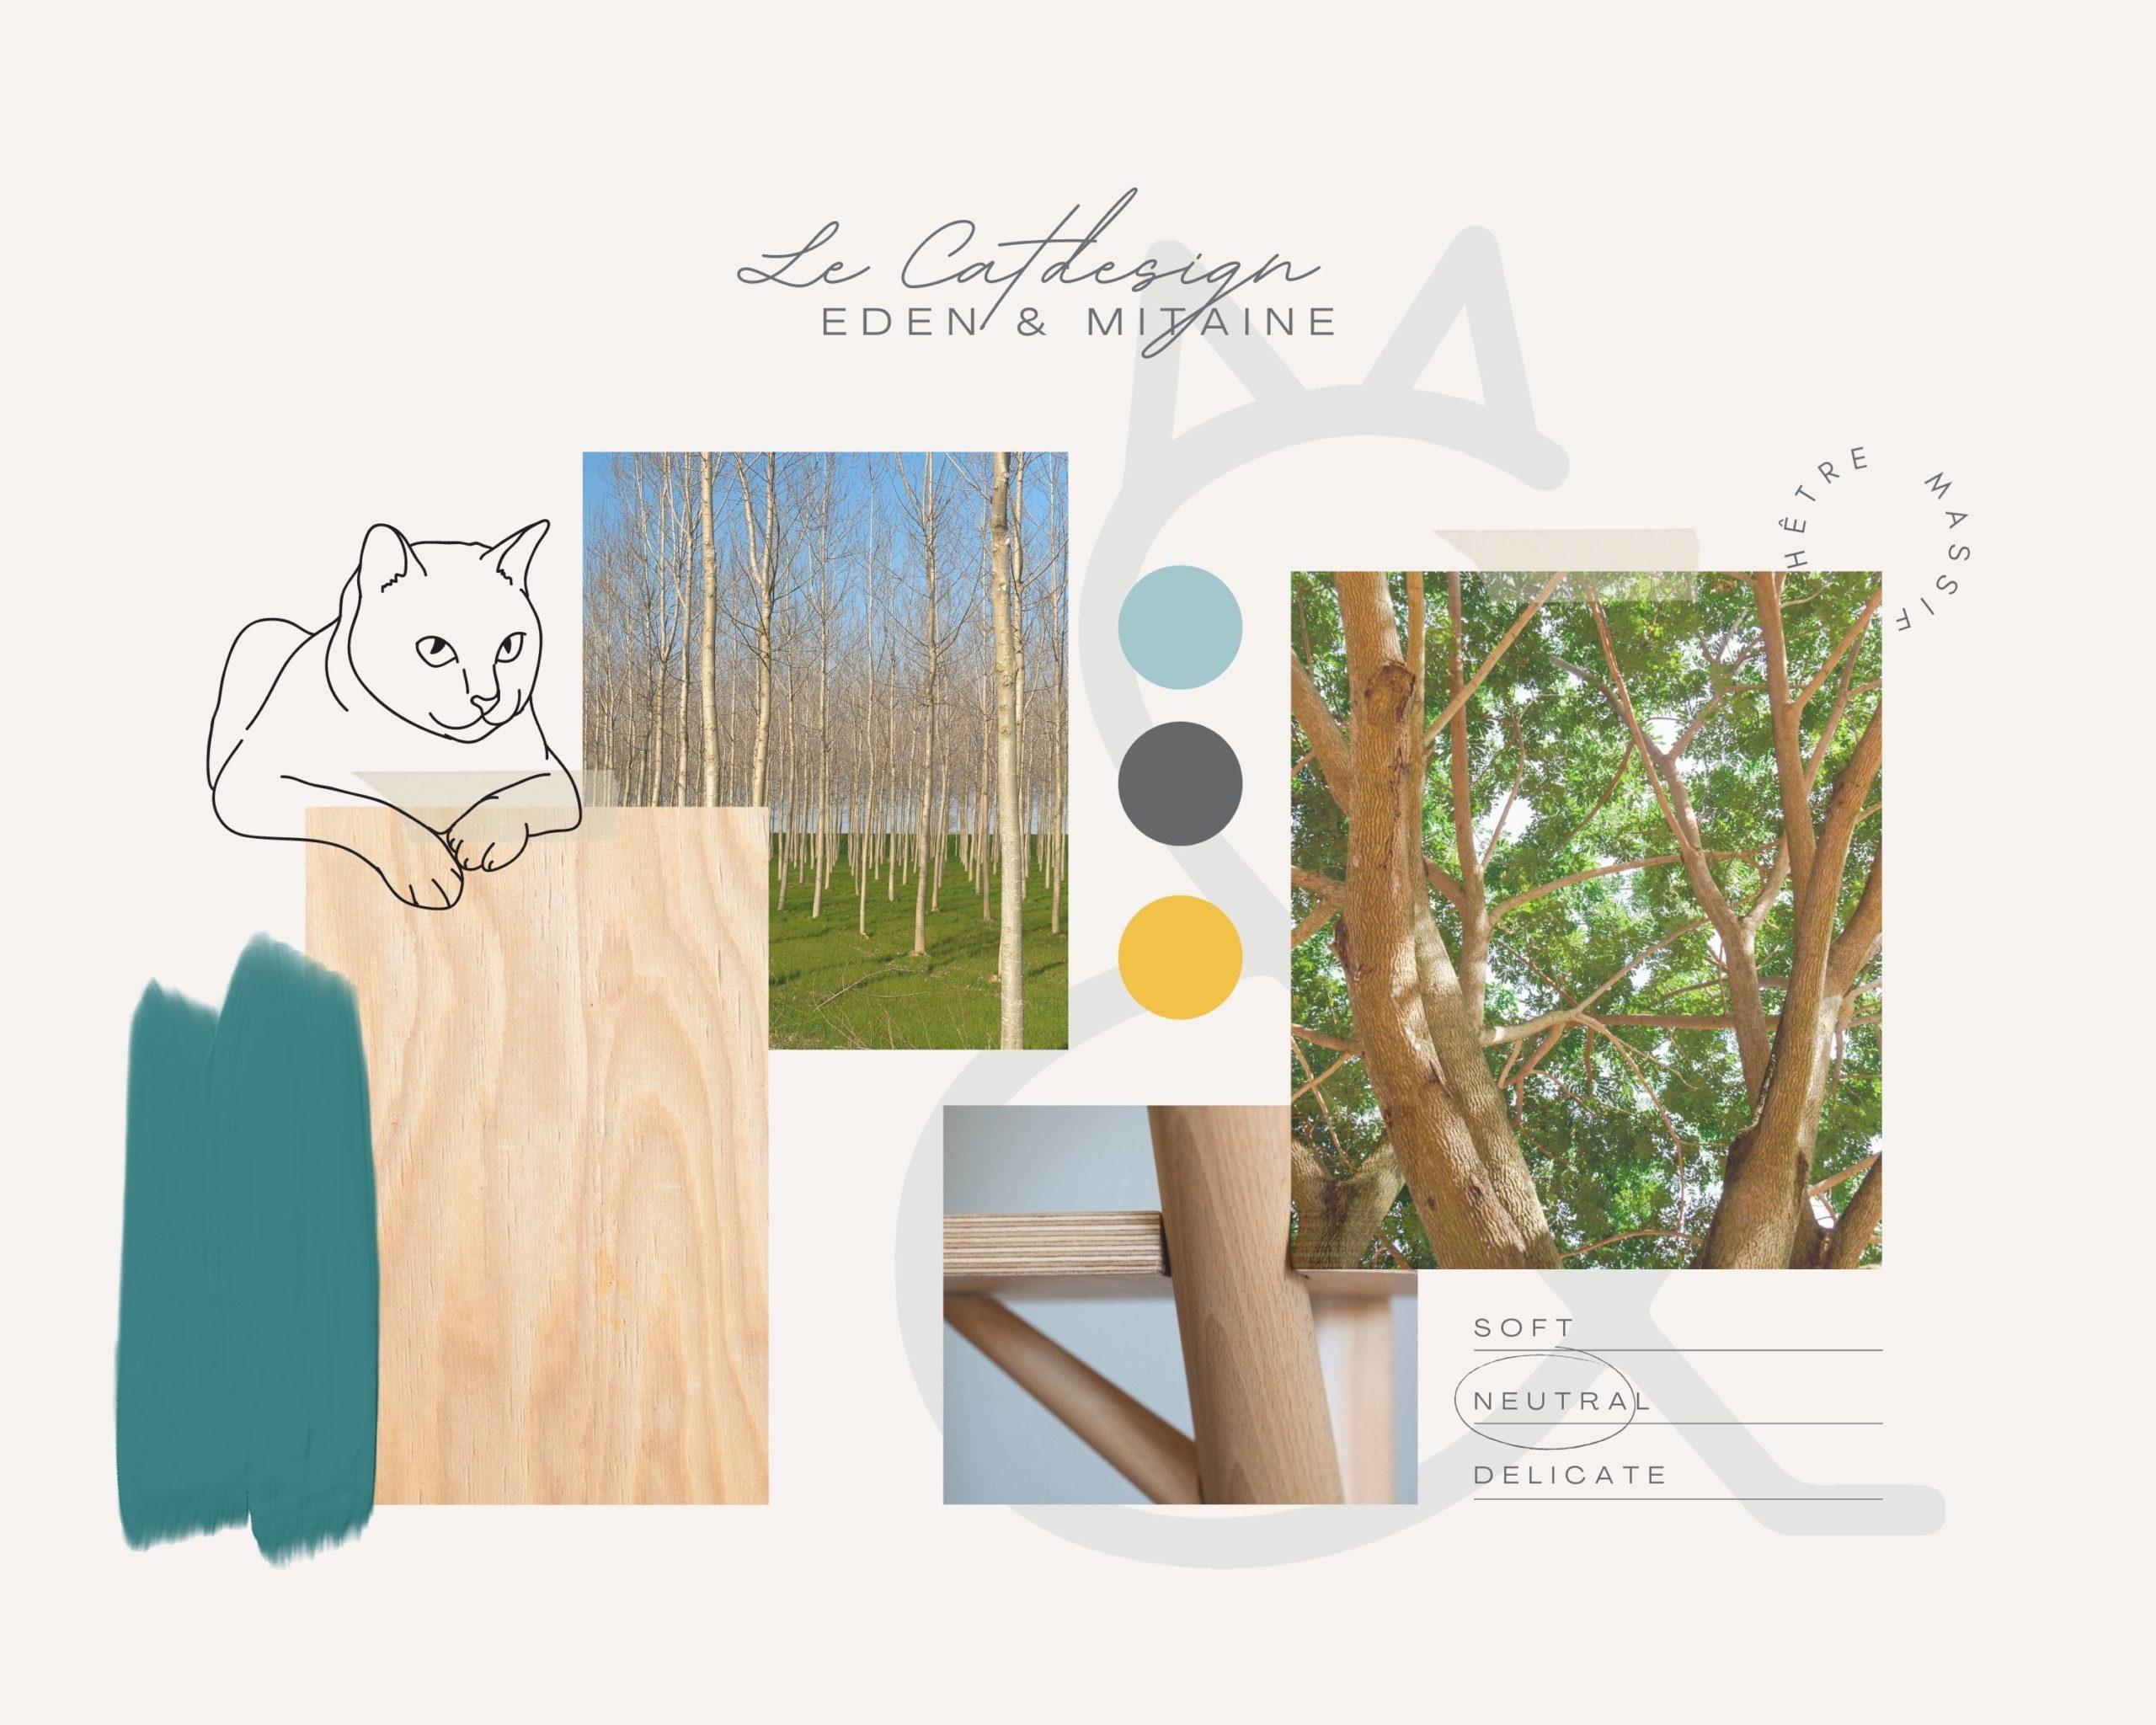 Moodboard arbre à chat scandinave - Eden & Mitaine